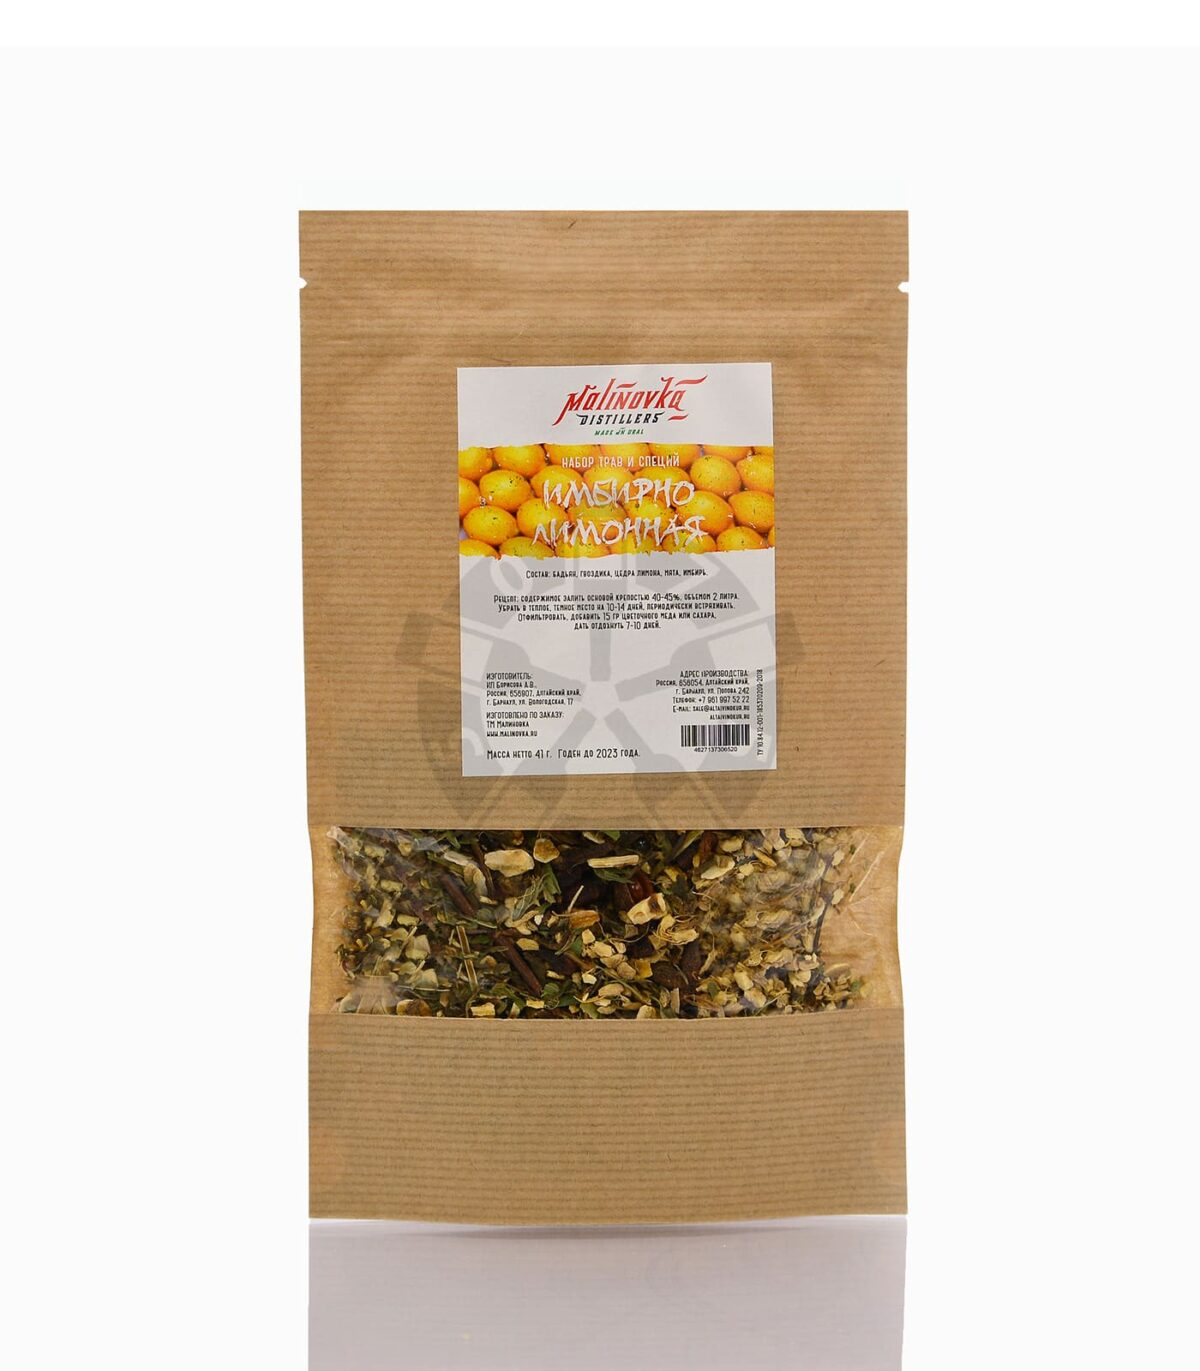 Набор трав и специй МАЛИНОВКА Имбирно-лимонная